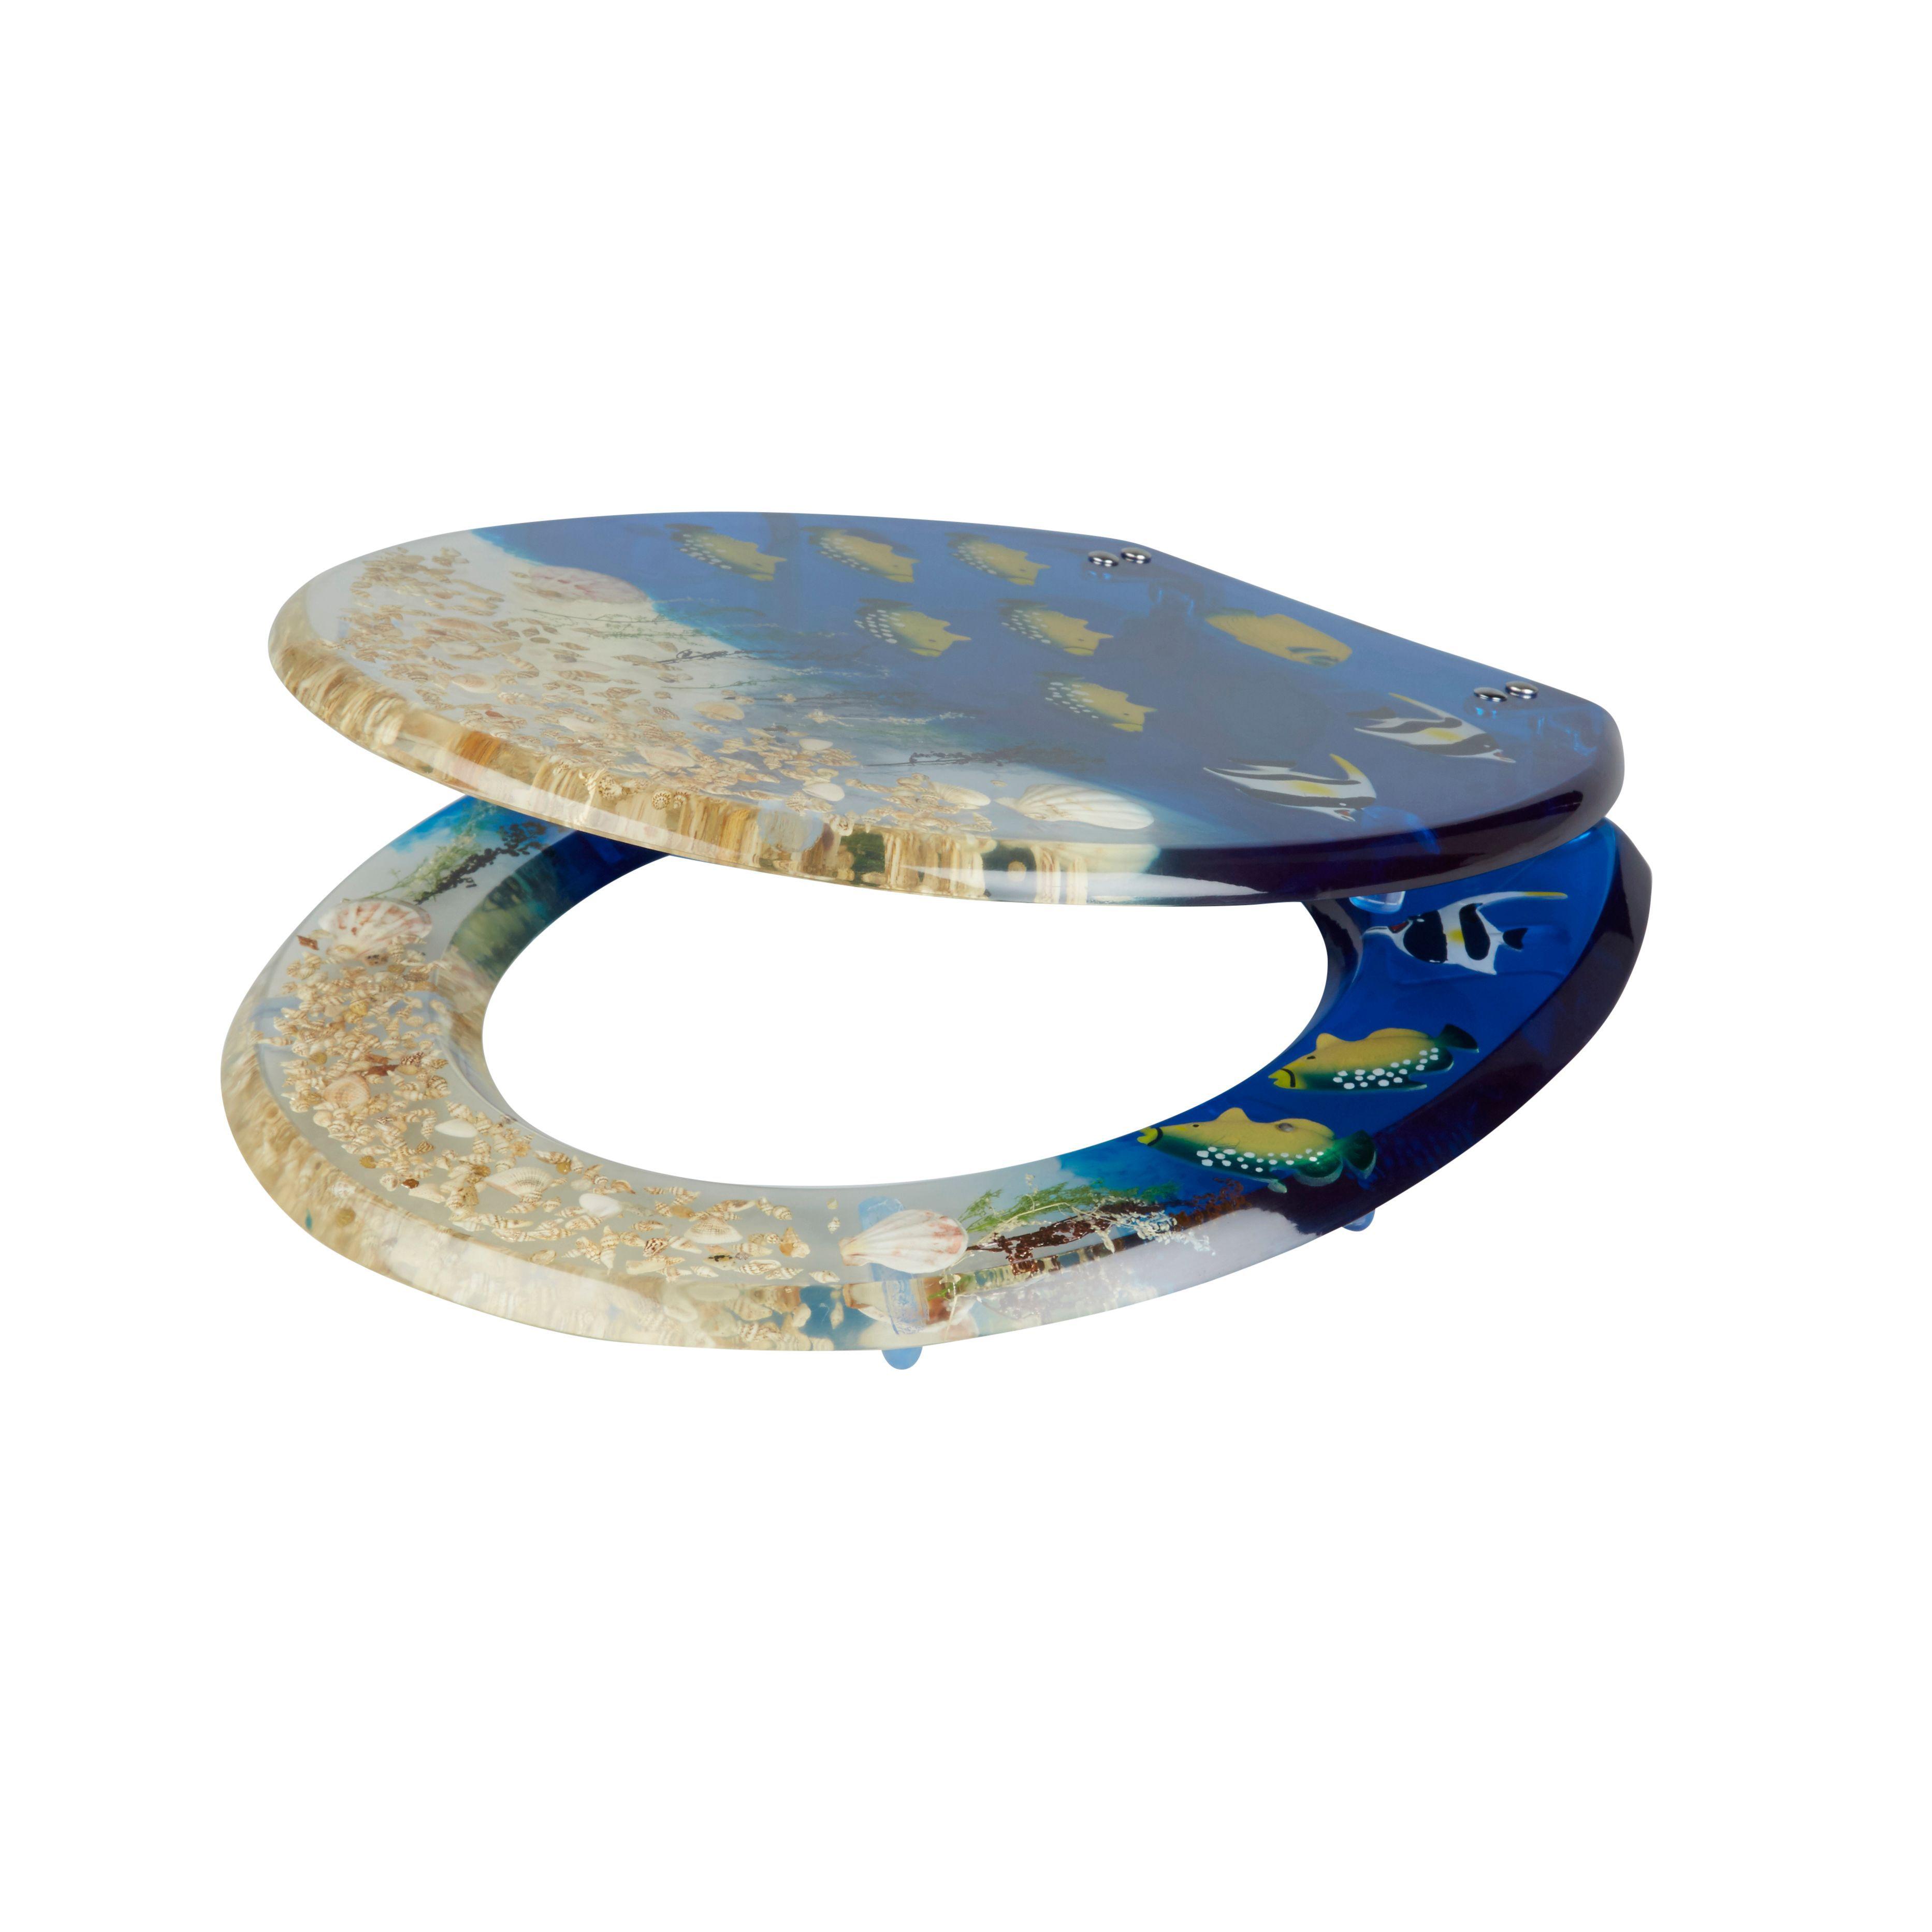 Super Cooke Lewis Andrano Multicolour Tropical Fish Standard Close Toilet Seat Departments Diy At Bq Creativecarmelina Interior Chair Design Creativecarmelinacom